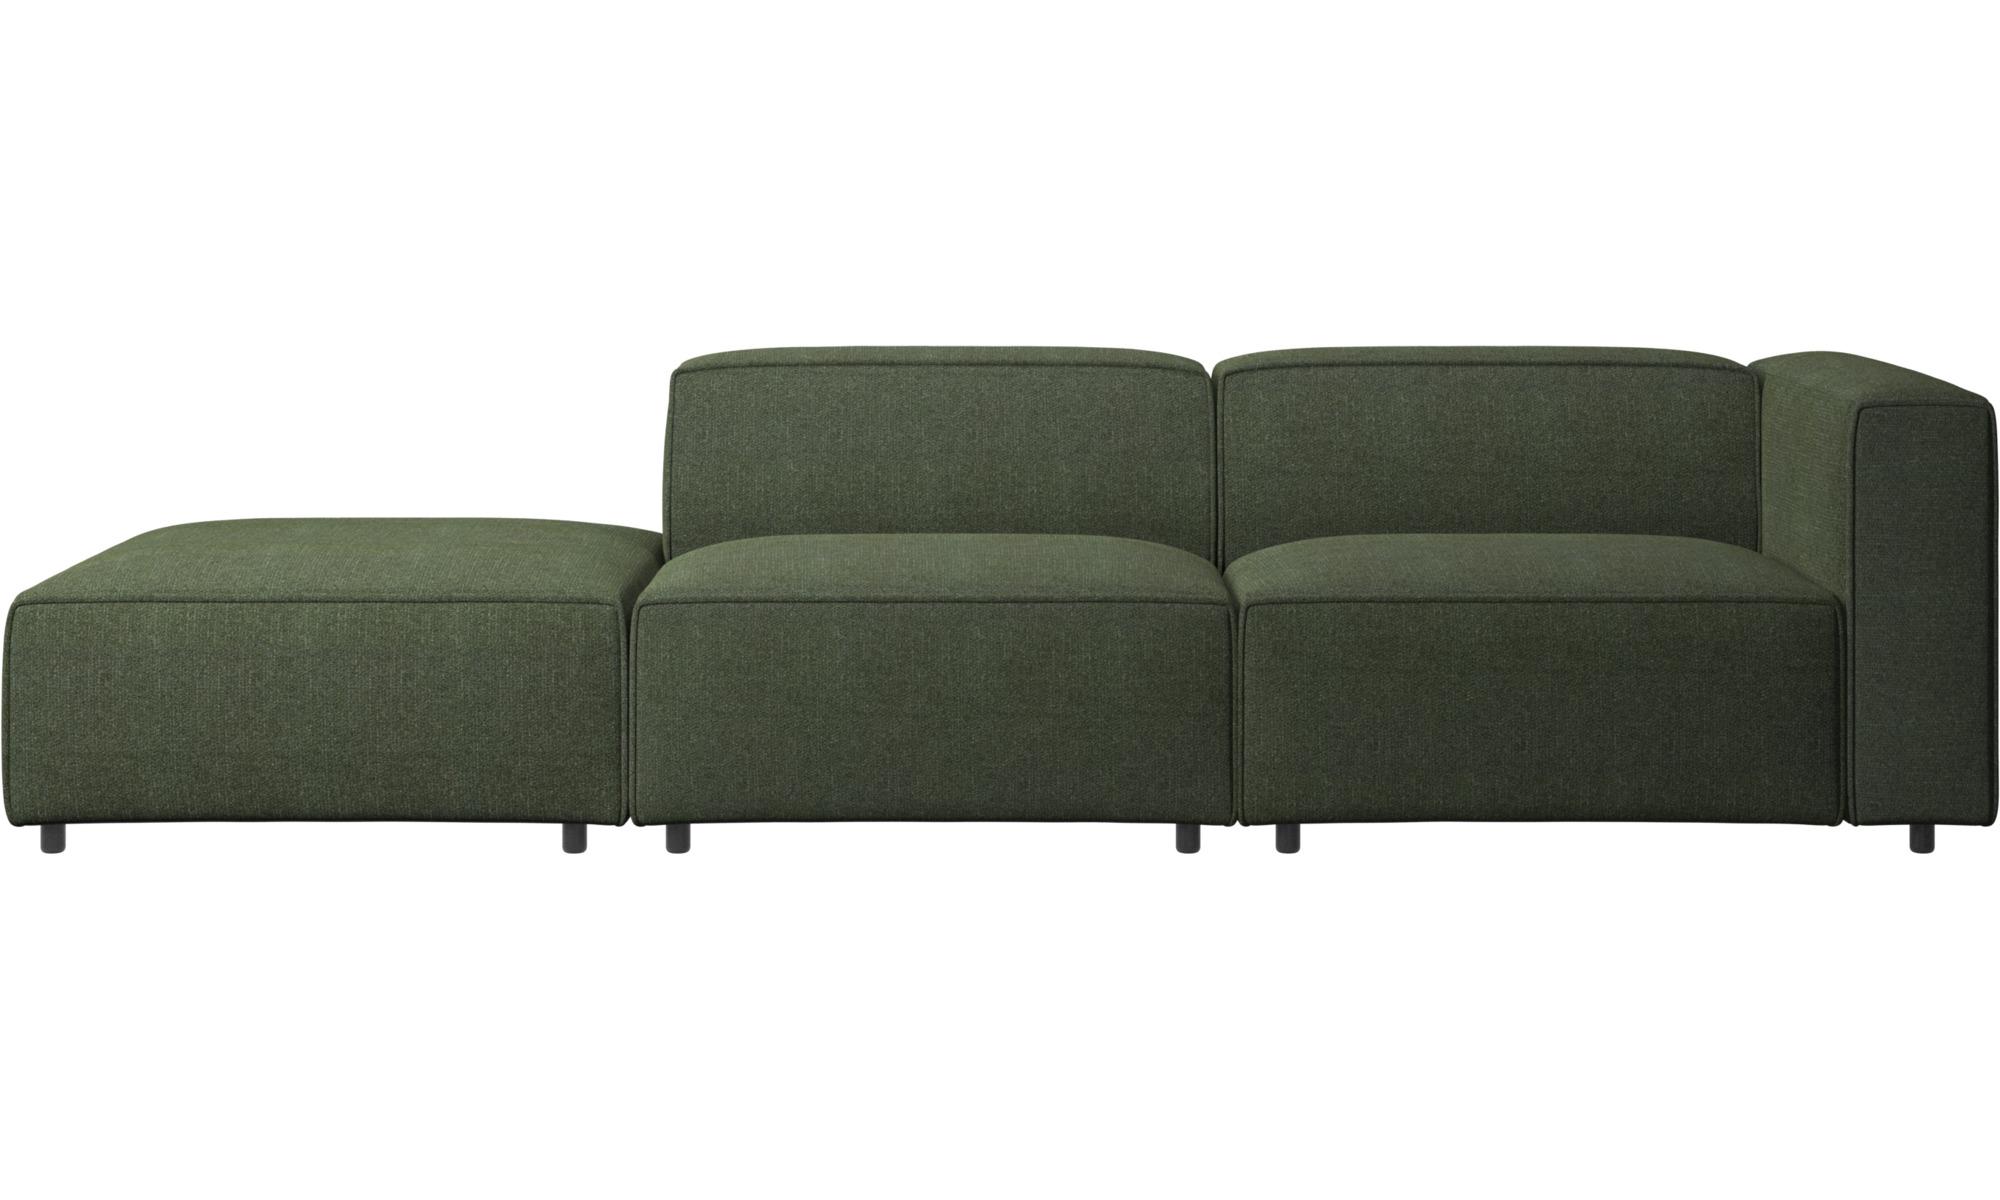 Modulære sofaer - Carmo sofa med loungemodul - Grøn - Stof